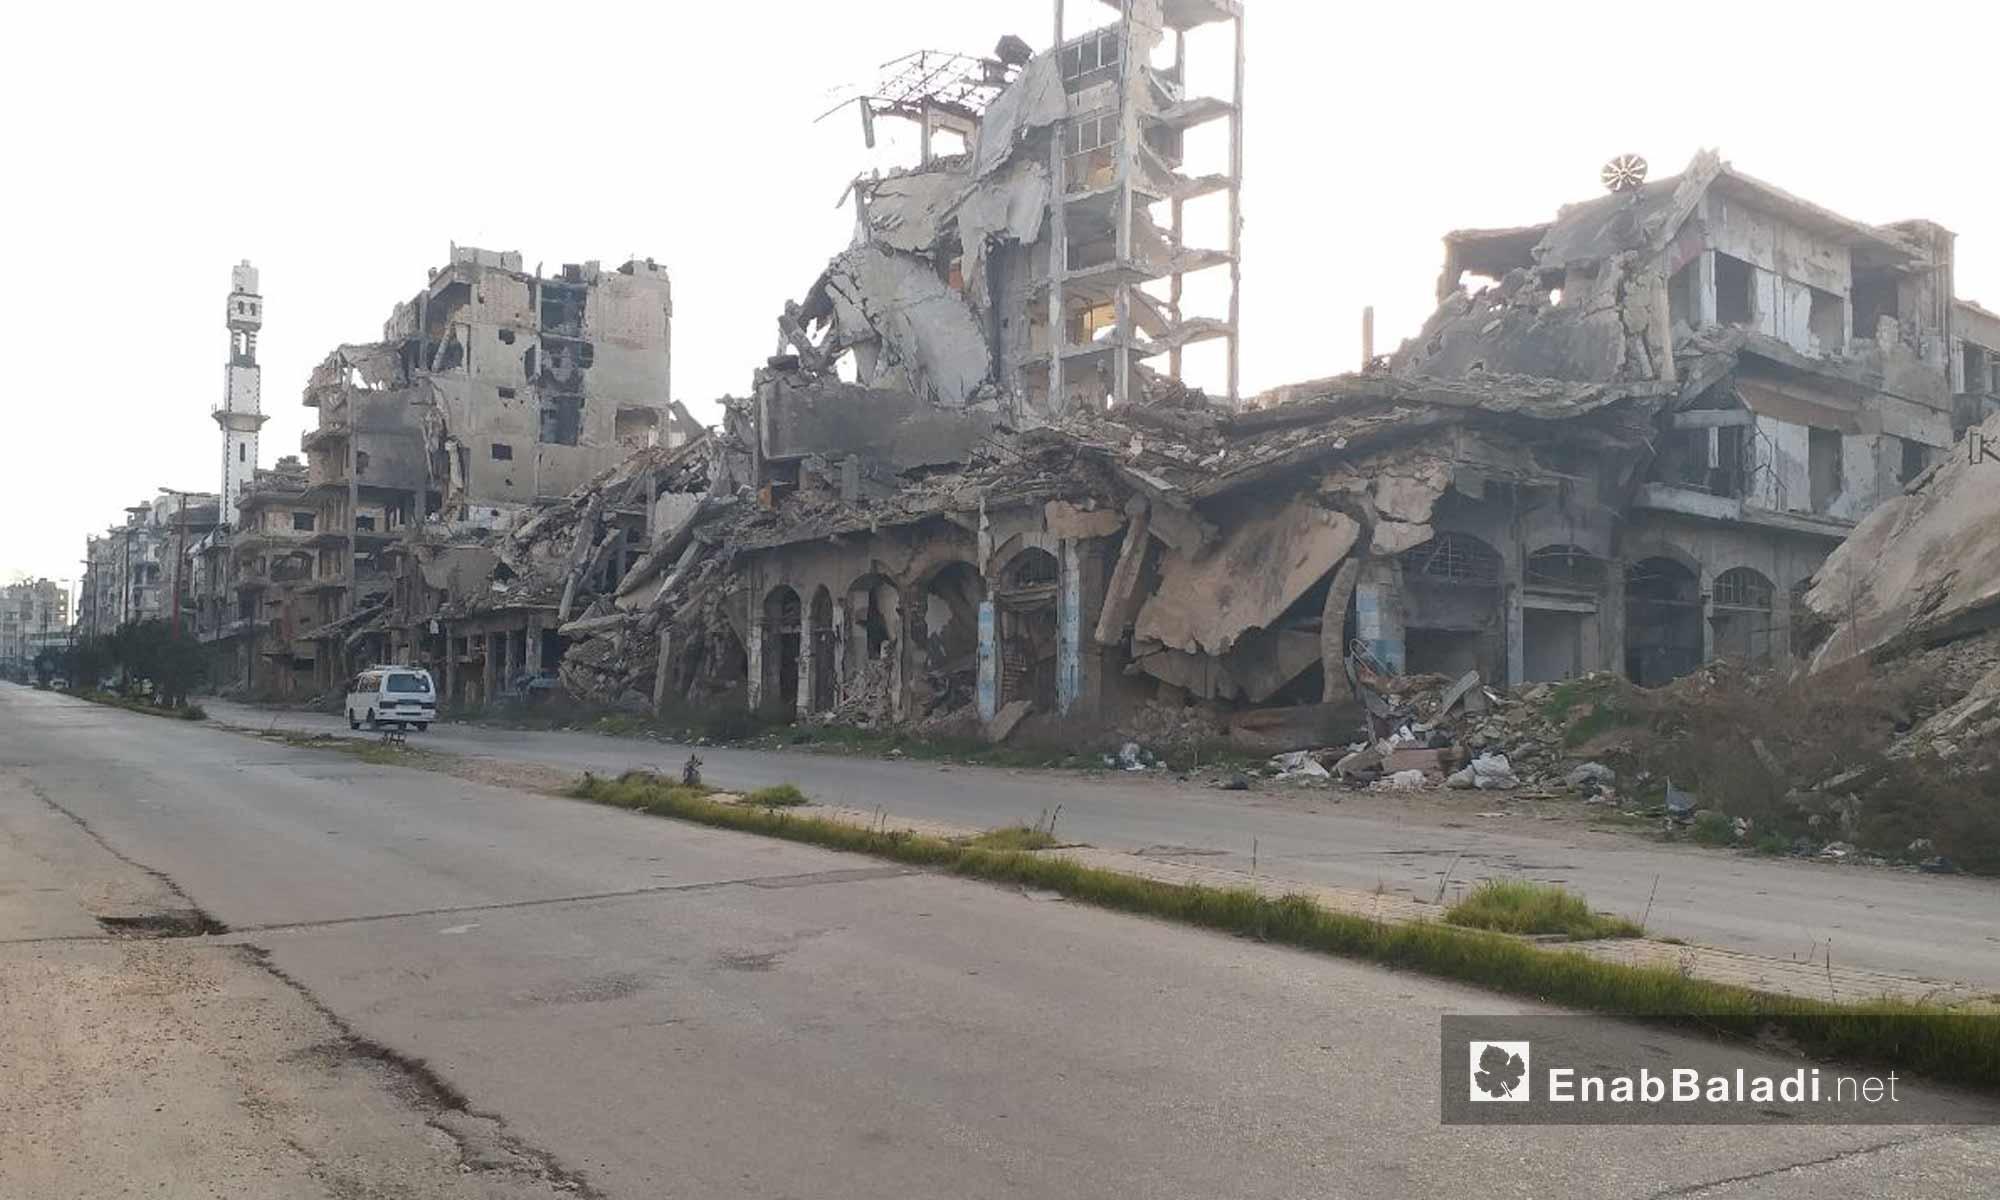 Al-Kussur neighborhood in the city of Homs - January 24, 2019 (Enab Baladi)